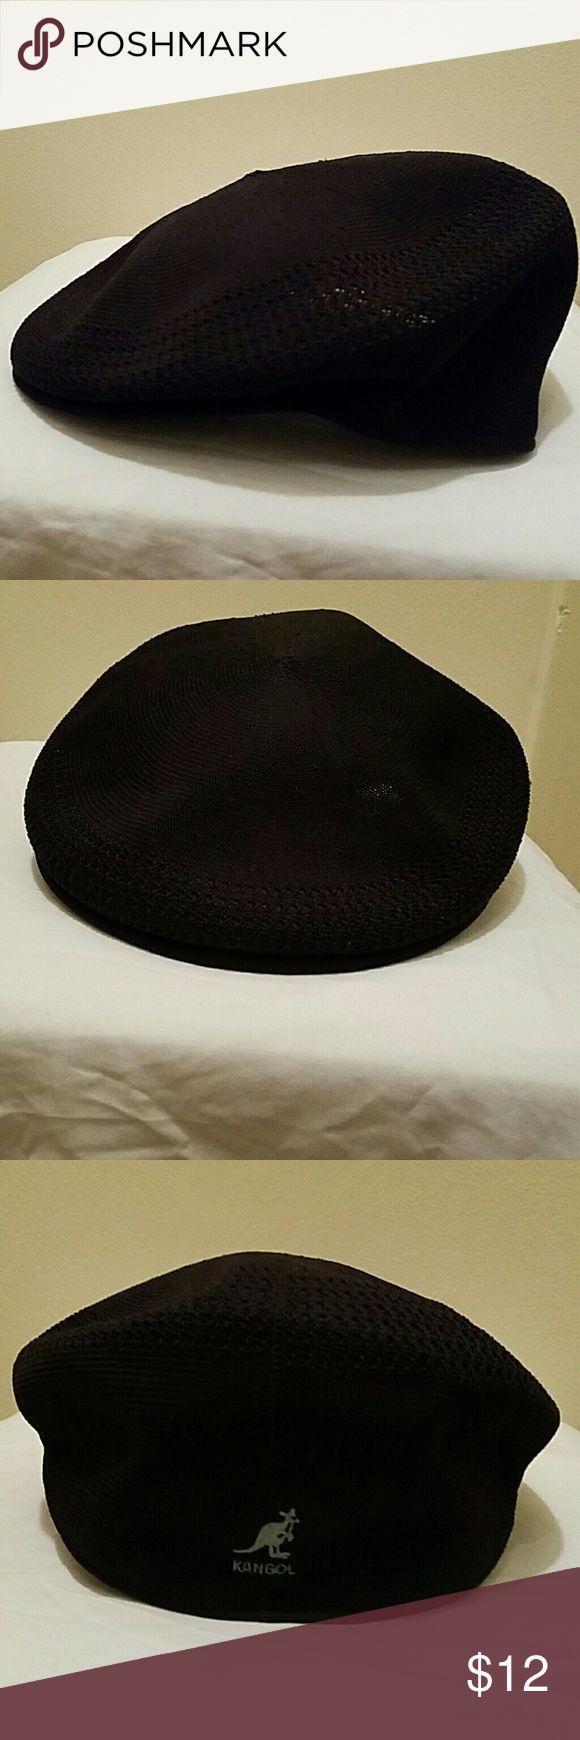 Kangol Cap 🌟 Black Kangol Men's Cap size Large Kangol Accessories Hats